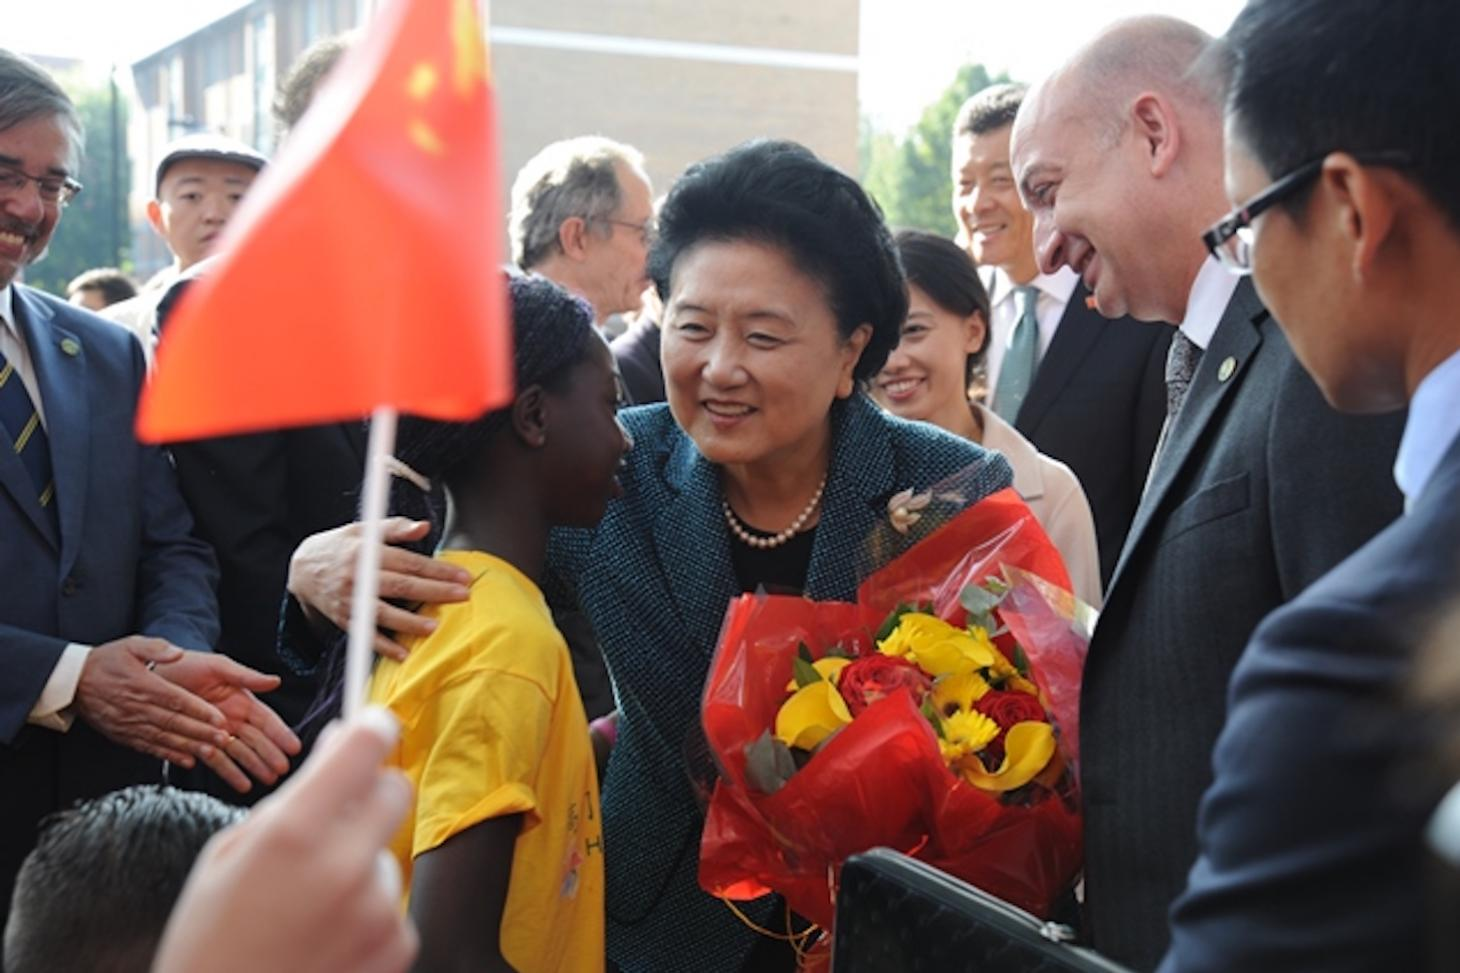 Chinese Vice-Premier Madame Liu Yandong visits LSBU